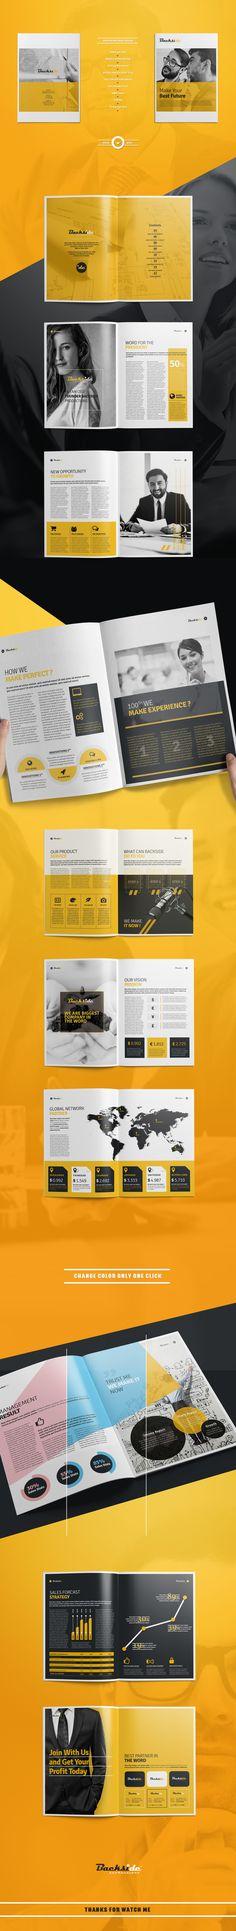 Brochure by AlfianBrand™ on Creative Market Corporate Brochure Design, Brochure Layout, Branding Design, Brochure Trifold, Company Brochure, Brochure Template, Editorial Design, Editorial Layout, Brochure Inspiration